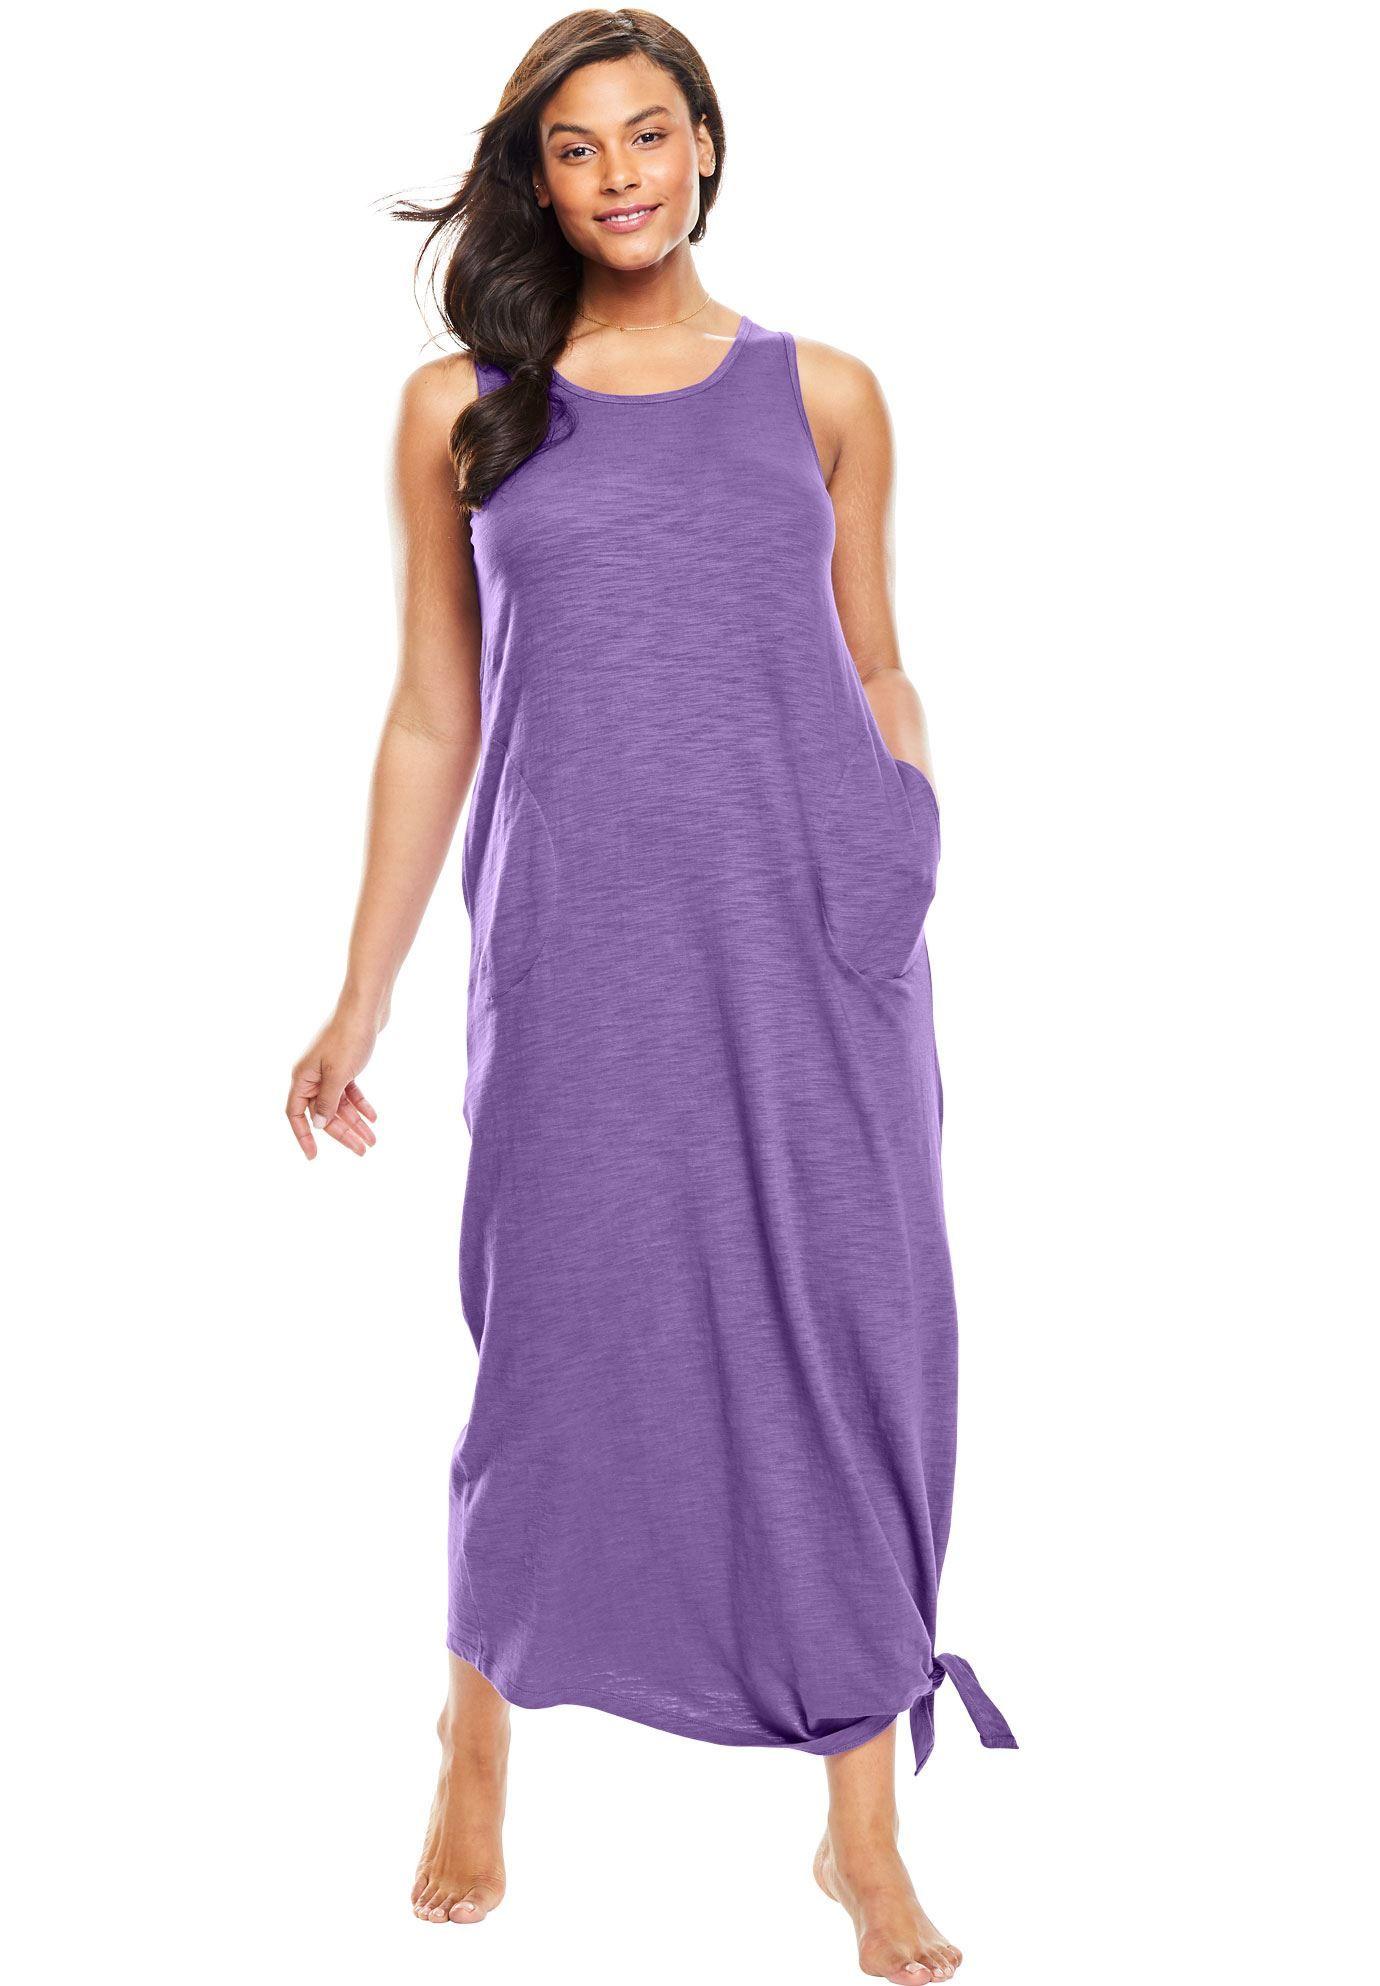 Long Sleeveless Lounger by Dreams & Co. - Women\'s Plus Size ...